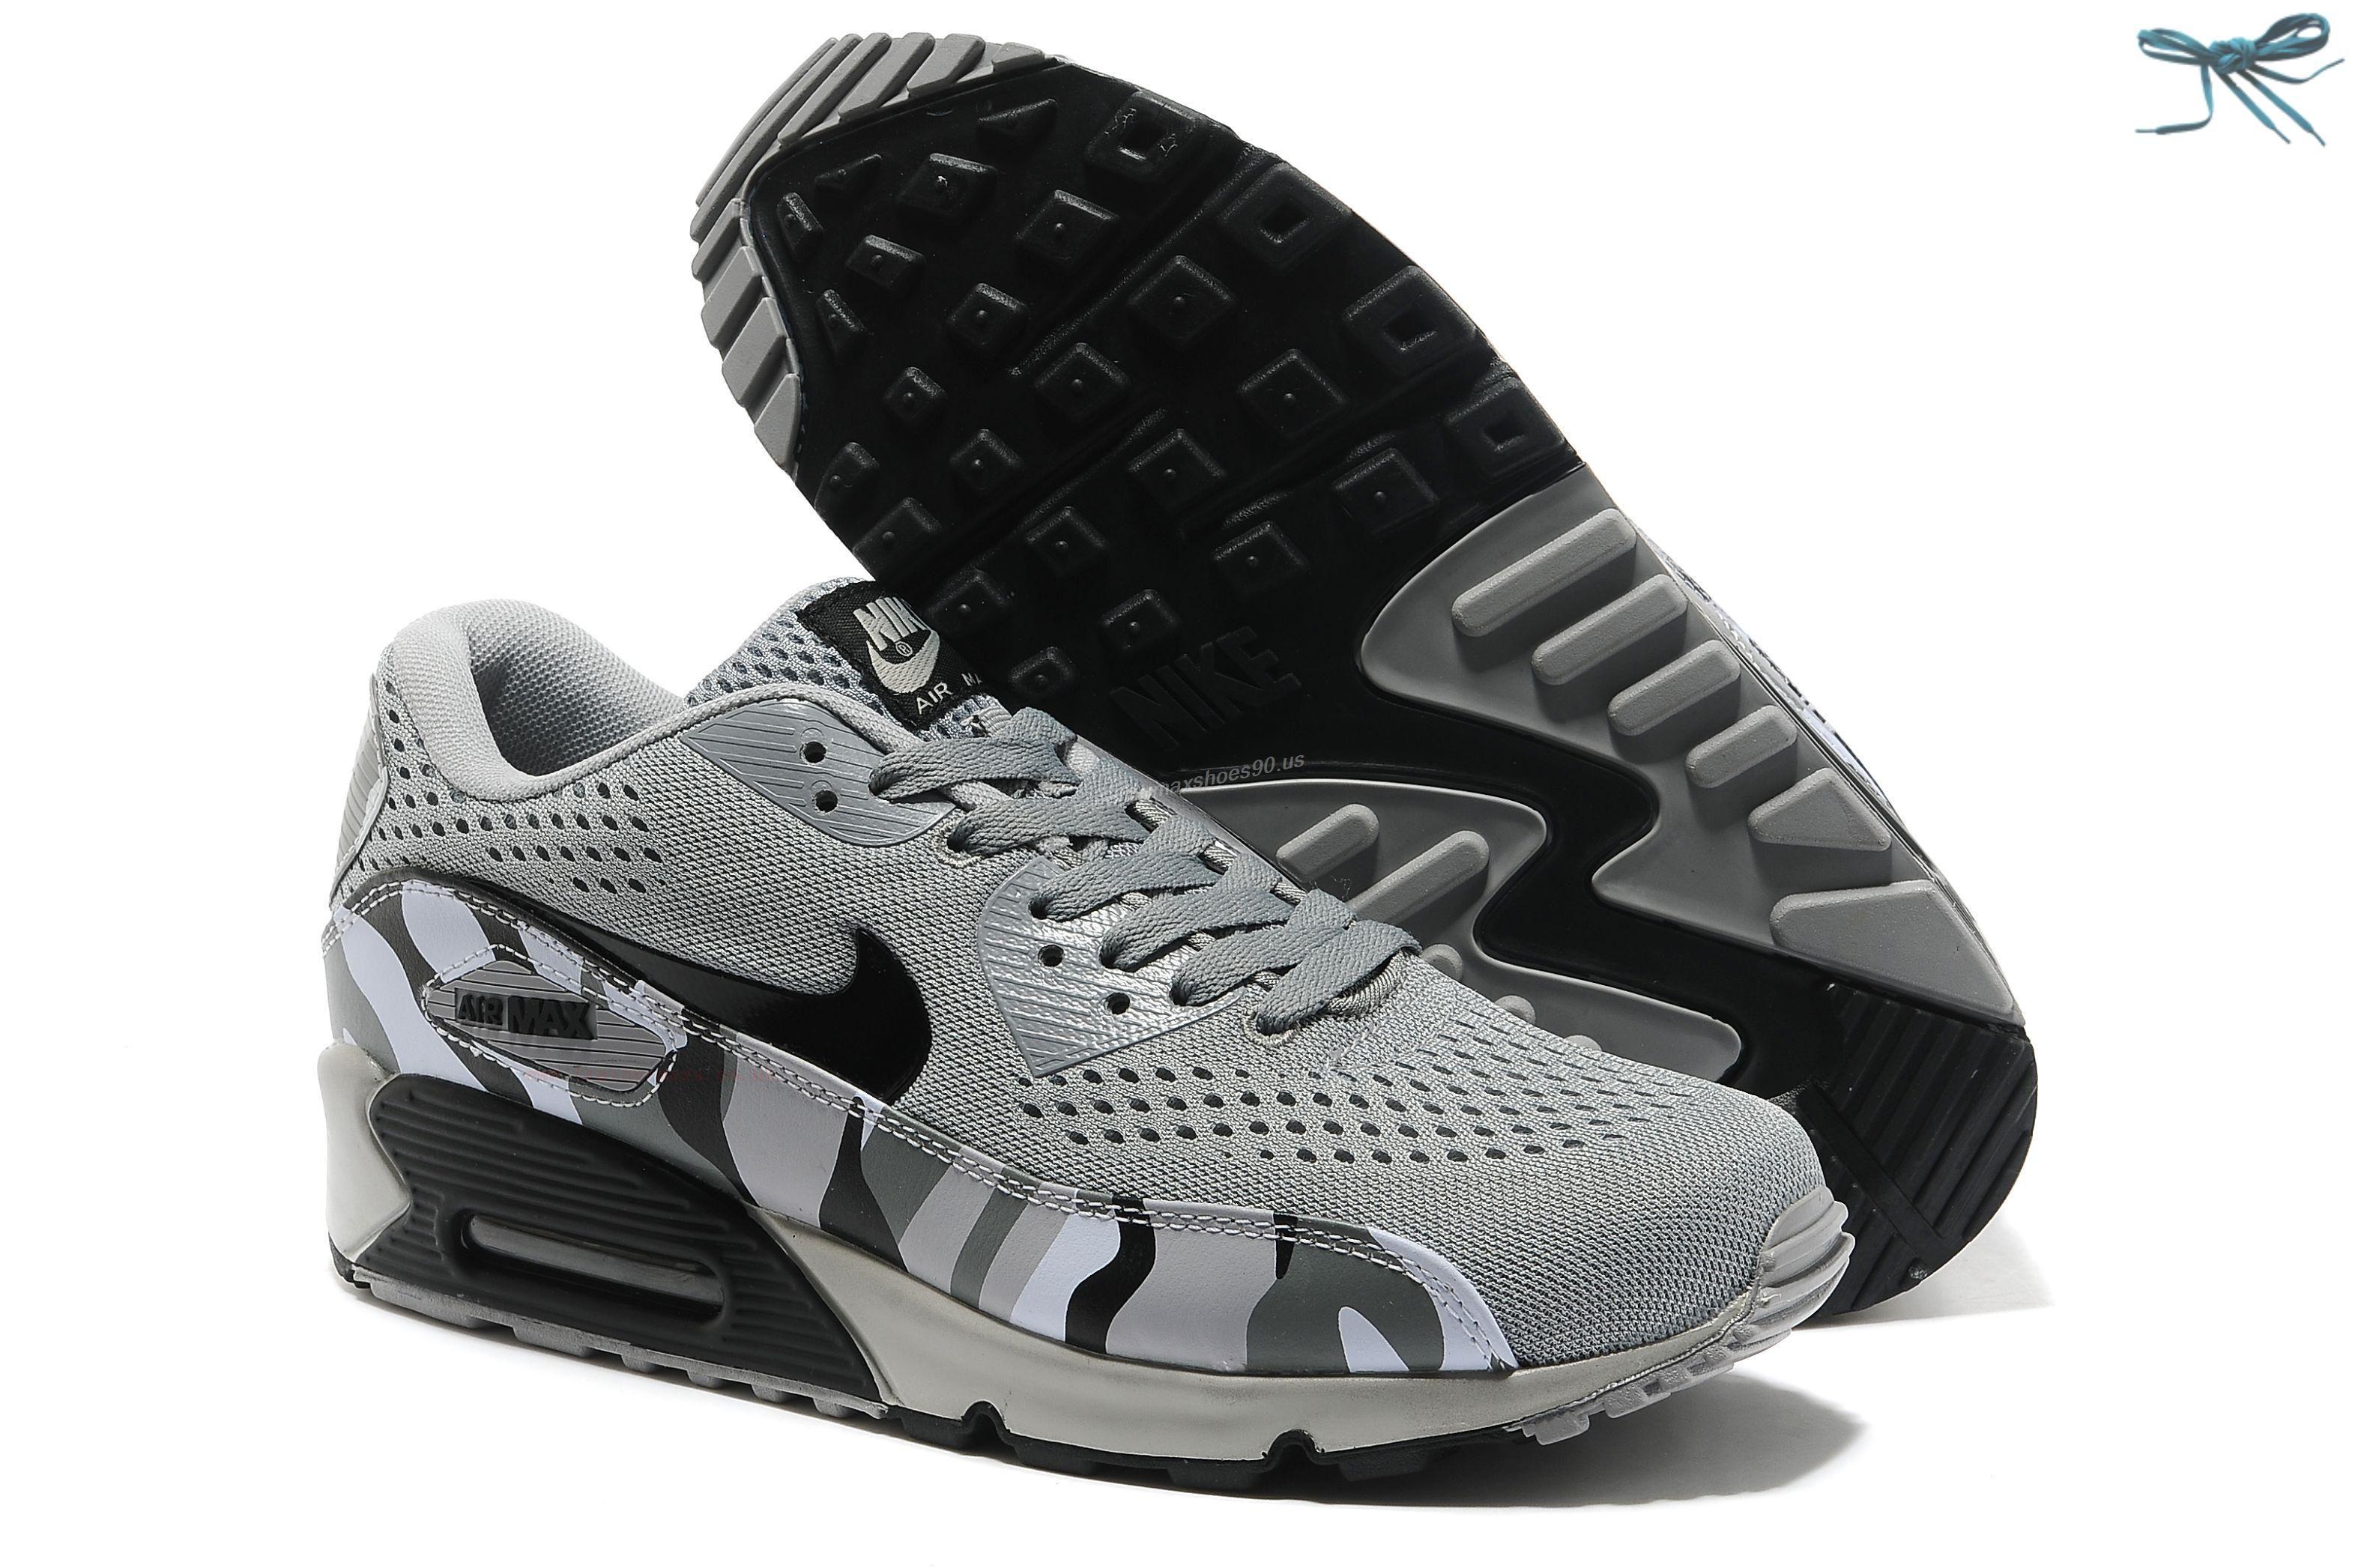 Explorez Chaussure, Nike Magasin et plus encore ! Weaving Gray Black Nike  Store For Air Max 90 ...